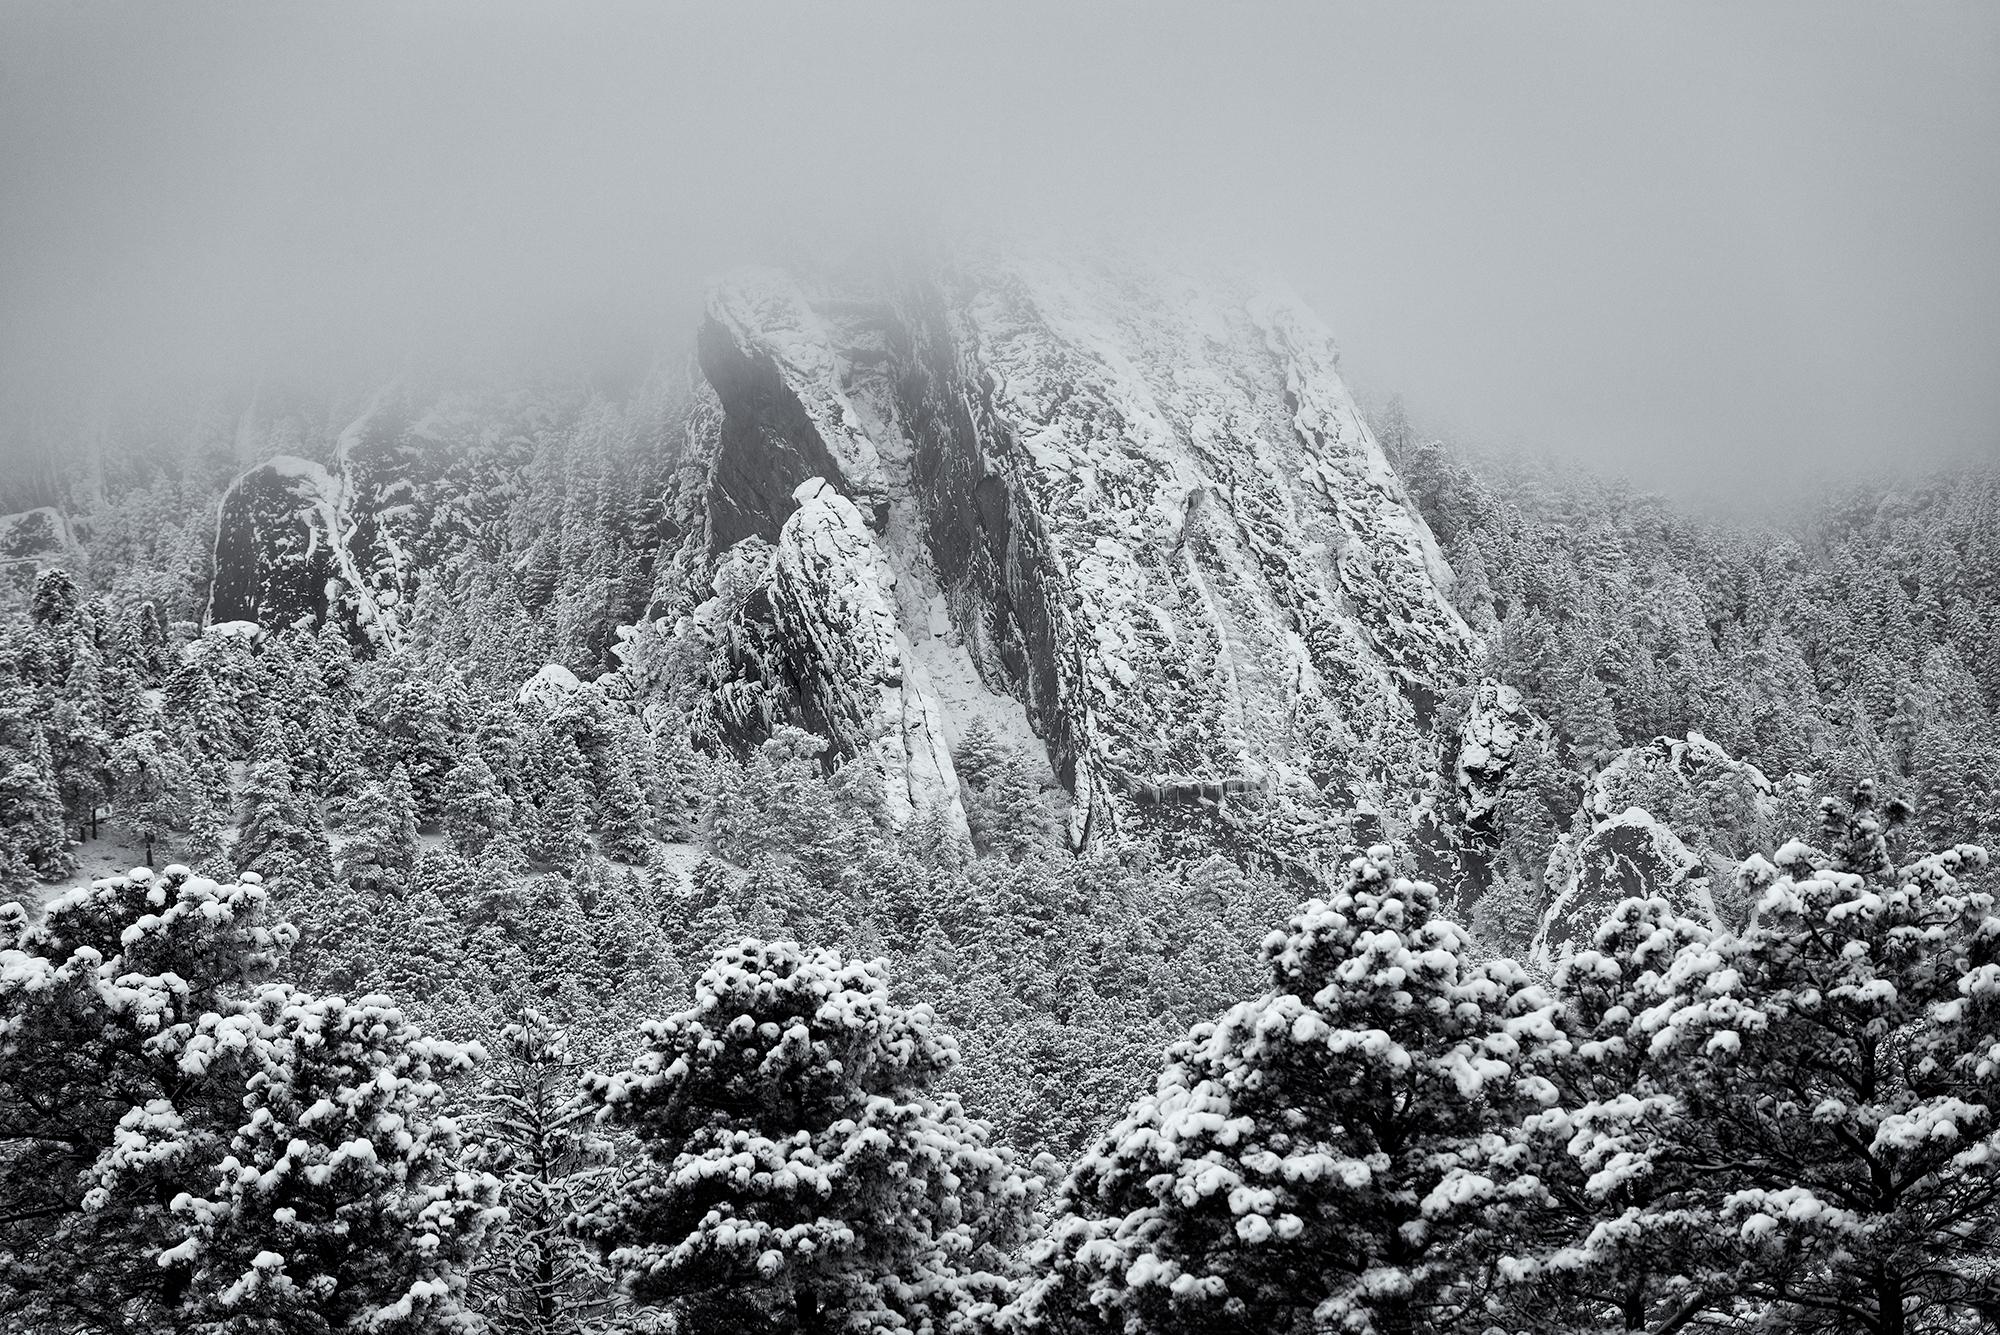 Third Flatiron, Winter Storm, #2. Boulder, Colorado, 2015